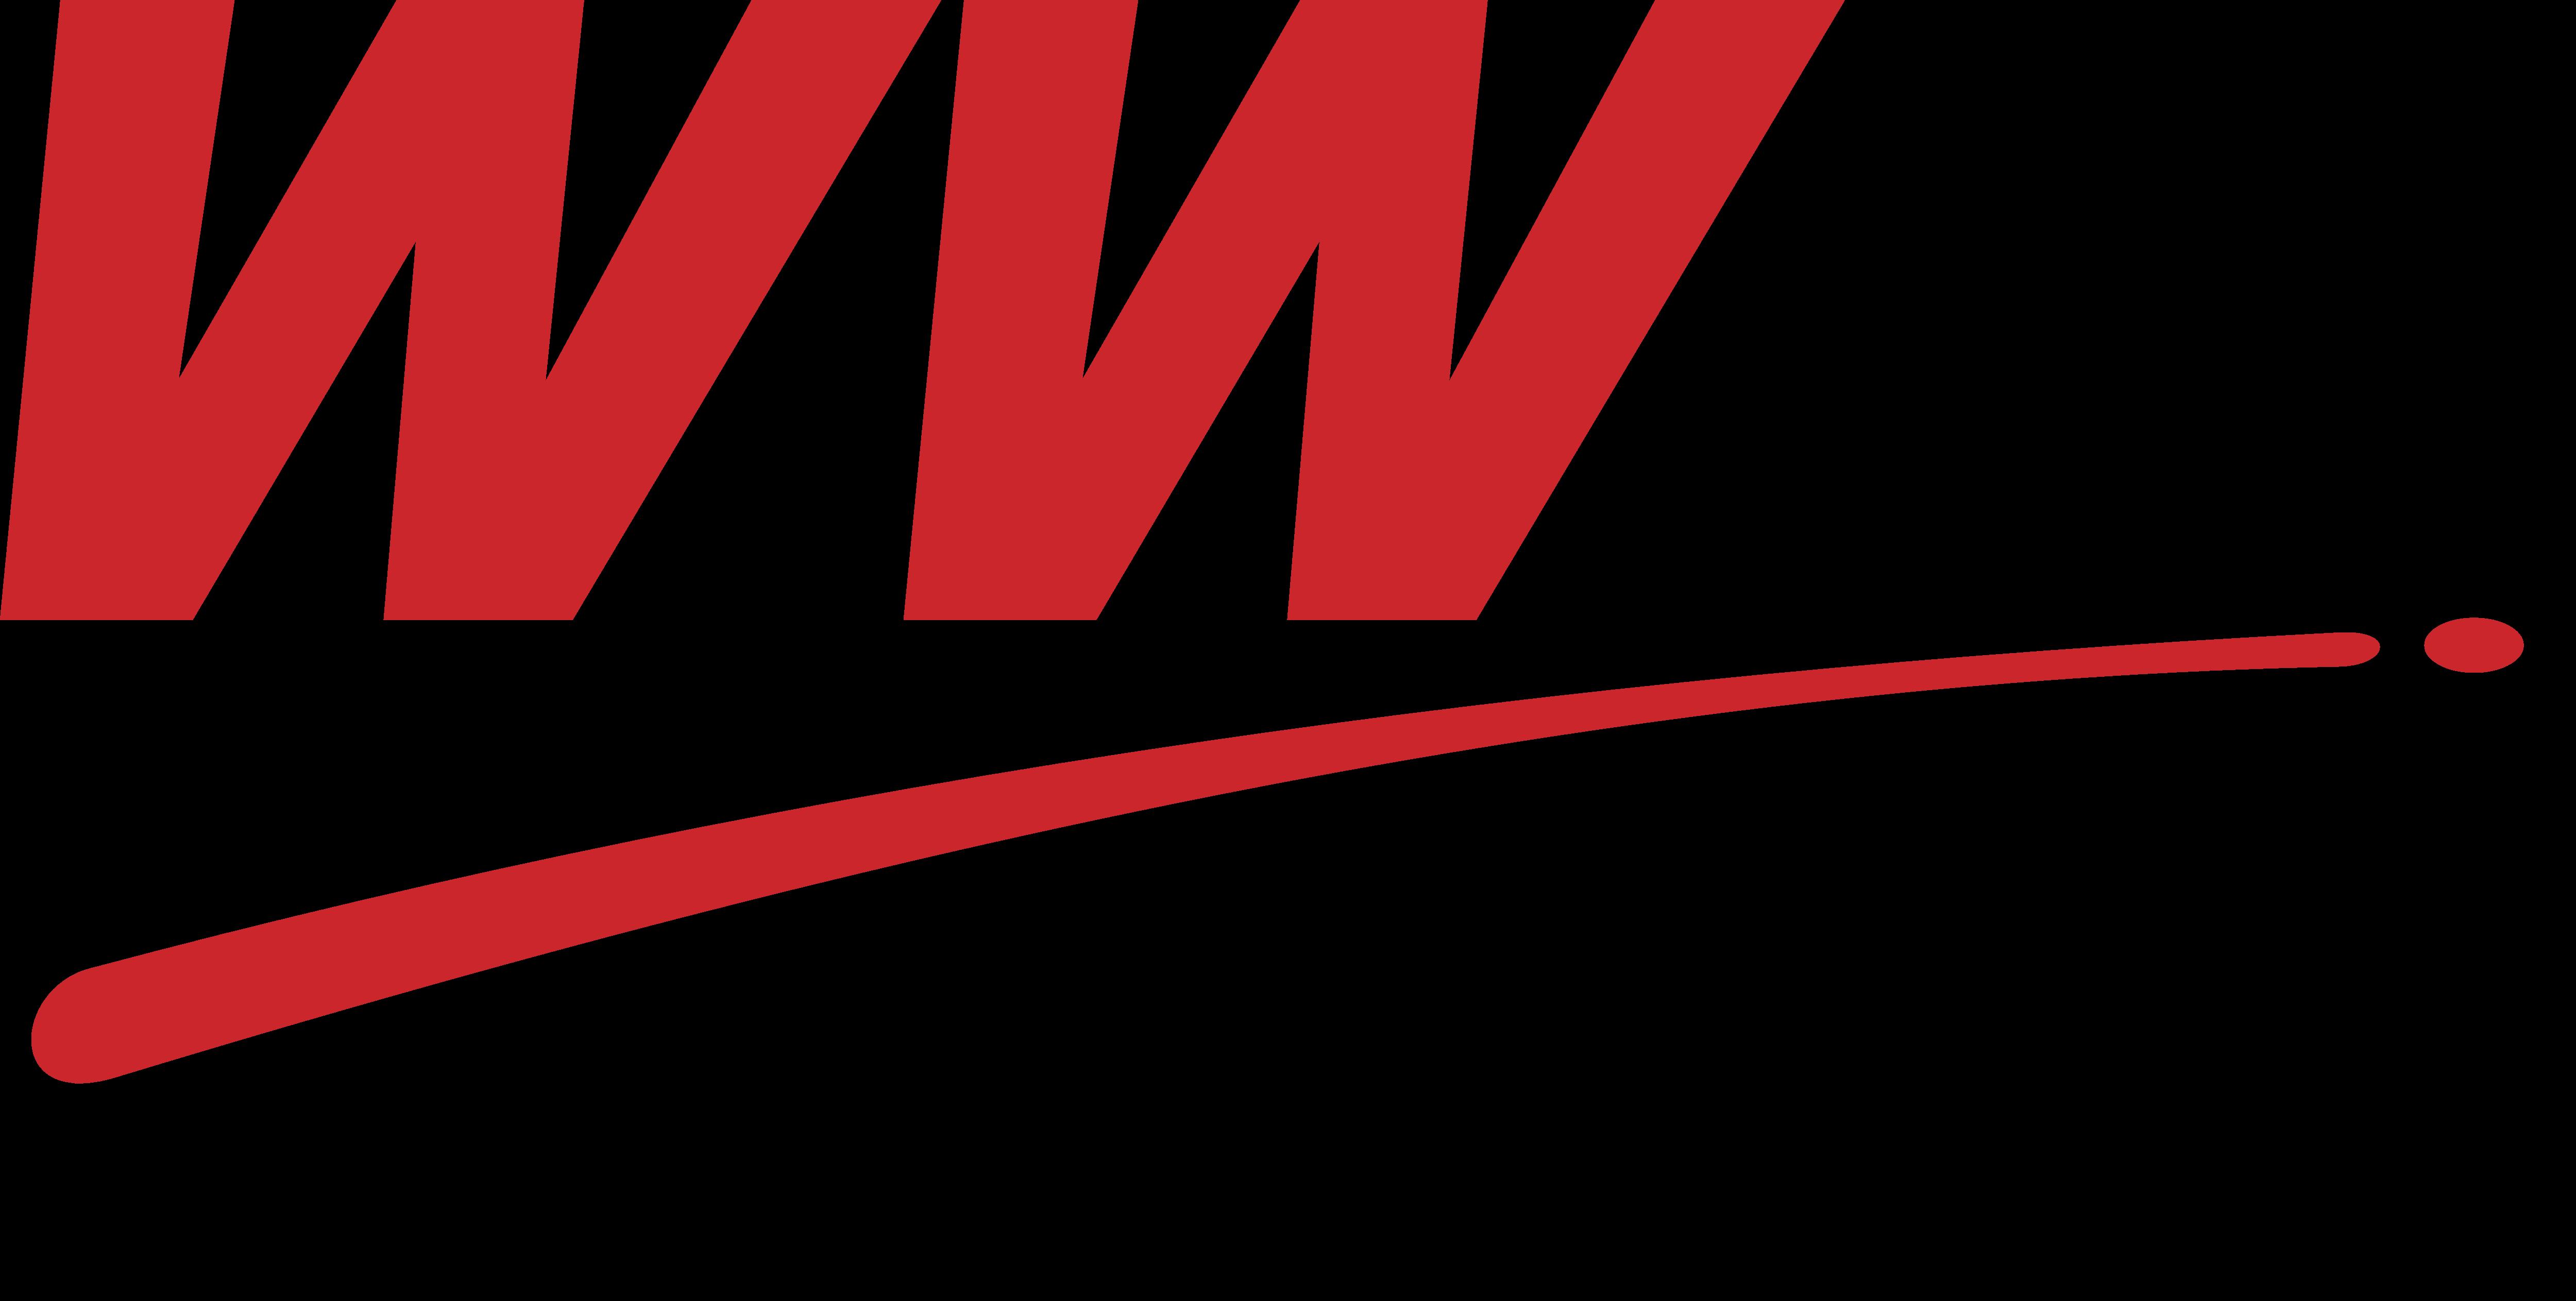 auto shop logos download rh logos download com auto shop logo design auto shop logo ideas